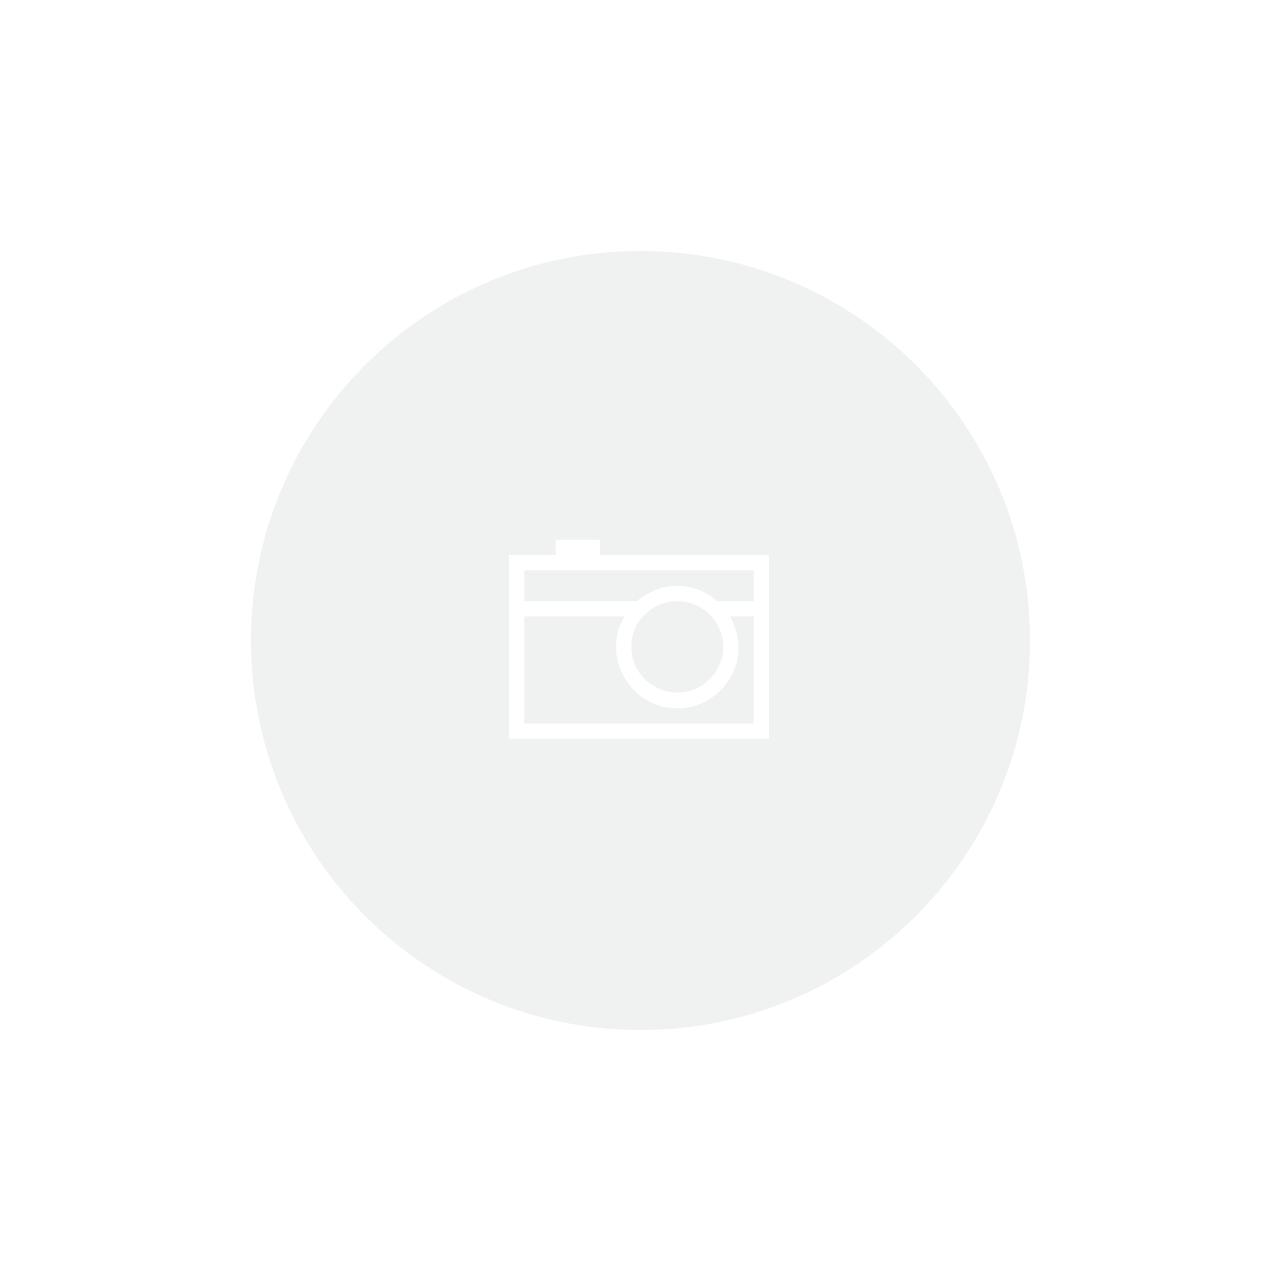 Filtro de ar Inbox BMC Air Filter para Mercedes Benz GLK 220 CDI